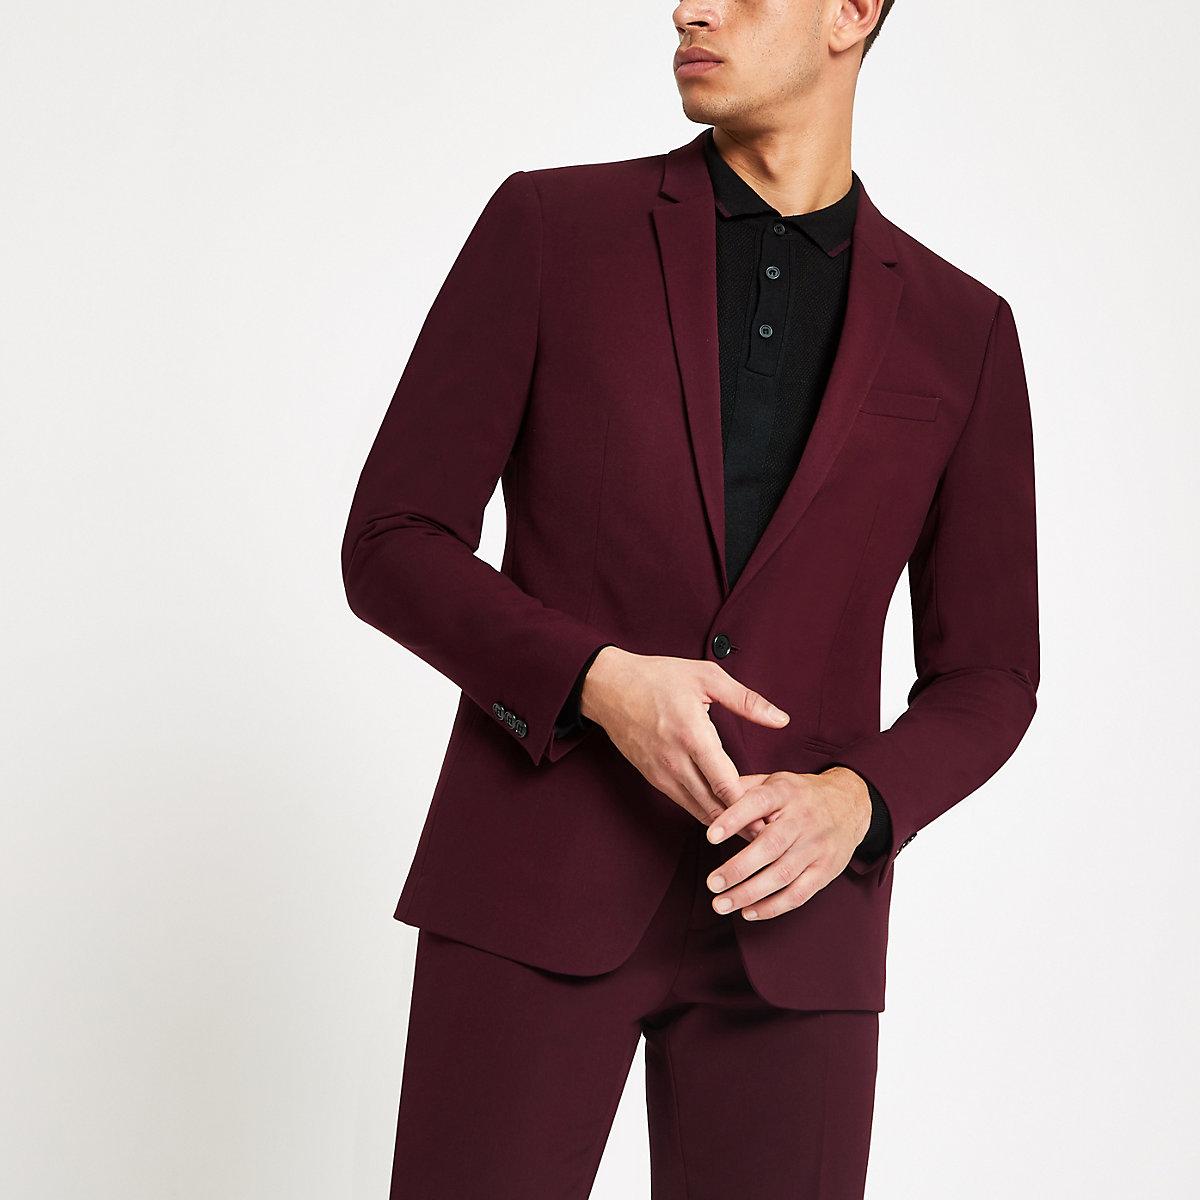 Veste de costume skinny bordeaux